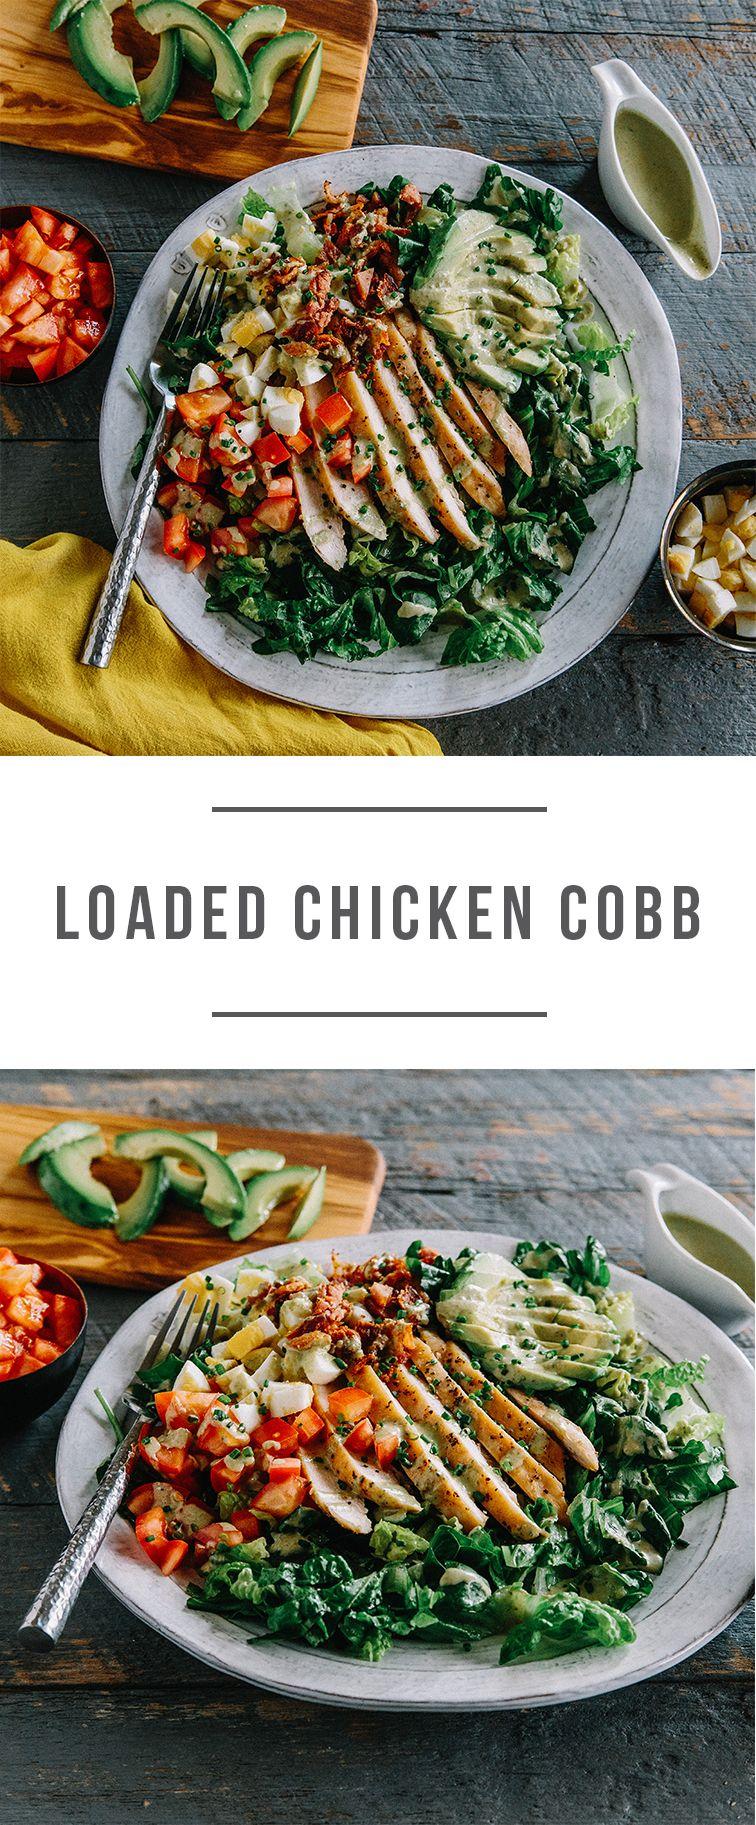 8 Best Green Chef Recipes ideas  green chef recipes, green chef